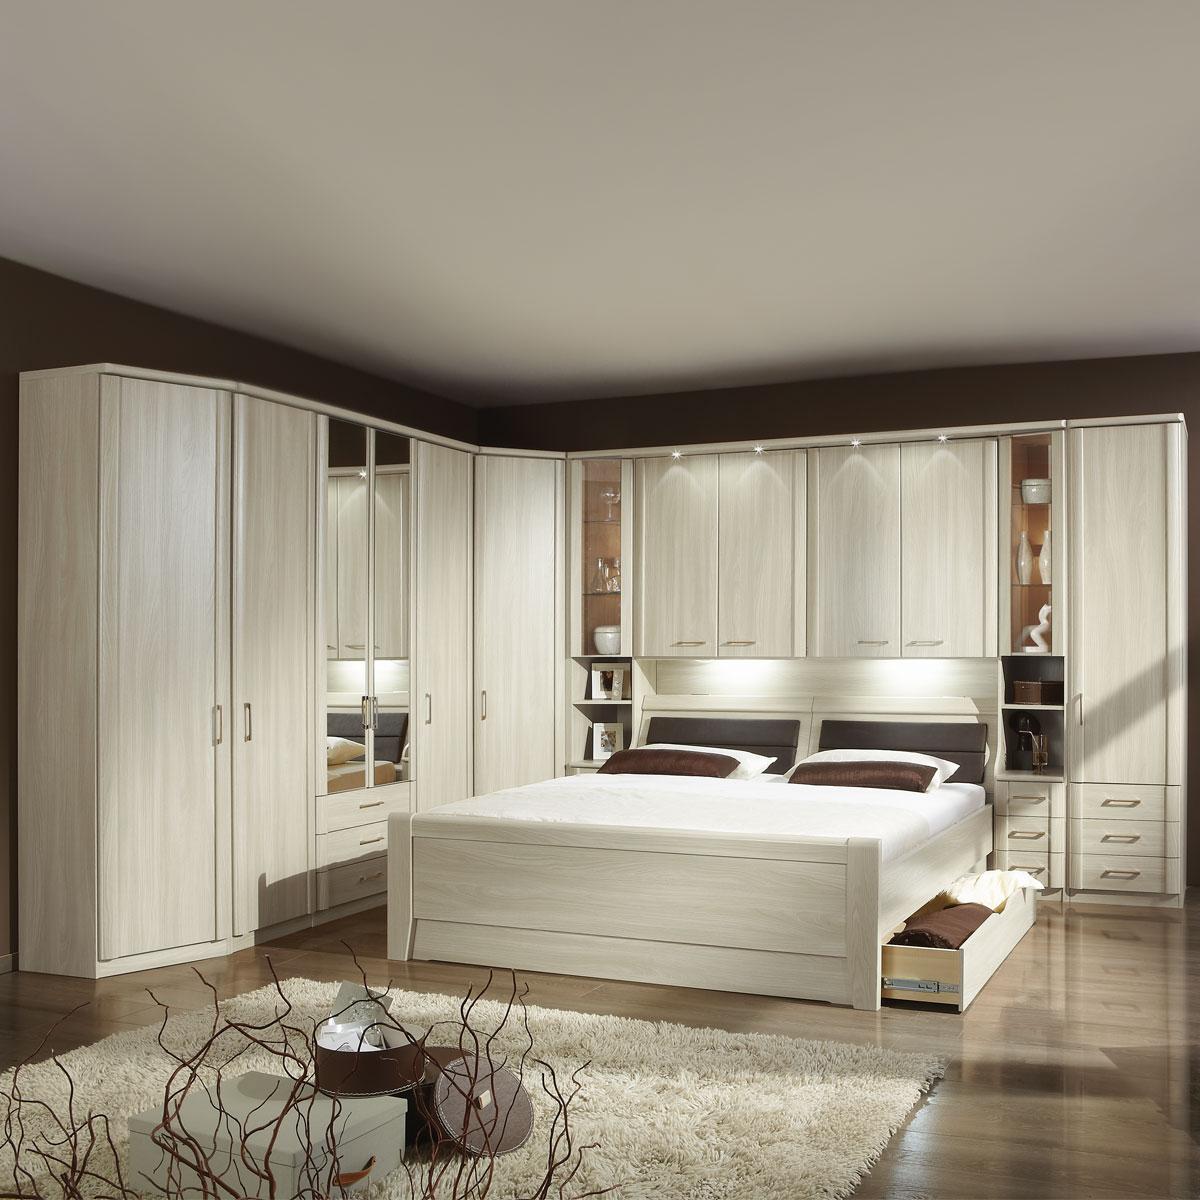 Full Size of Wiemann Schlafzimmer Loft Kommode Schrank Shanghai Lausanne Mainau 5d252e8e6db54 Weißes Wandleuchte Schranksysteme Massivholz Rauch Tapeten Wandtattoo Schlafzimmer Wiemann Schlafzimmer